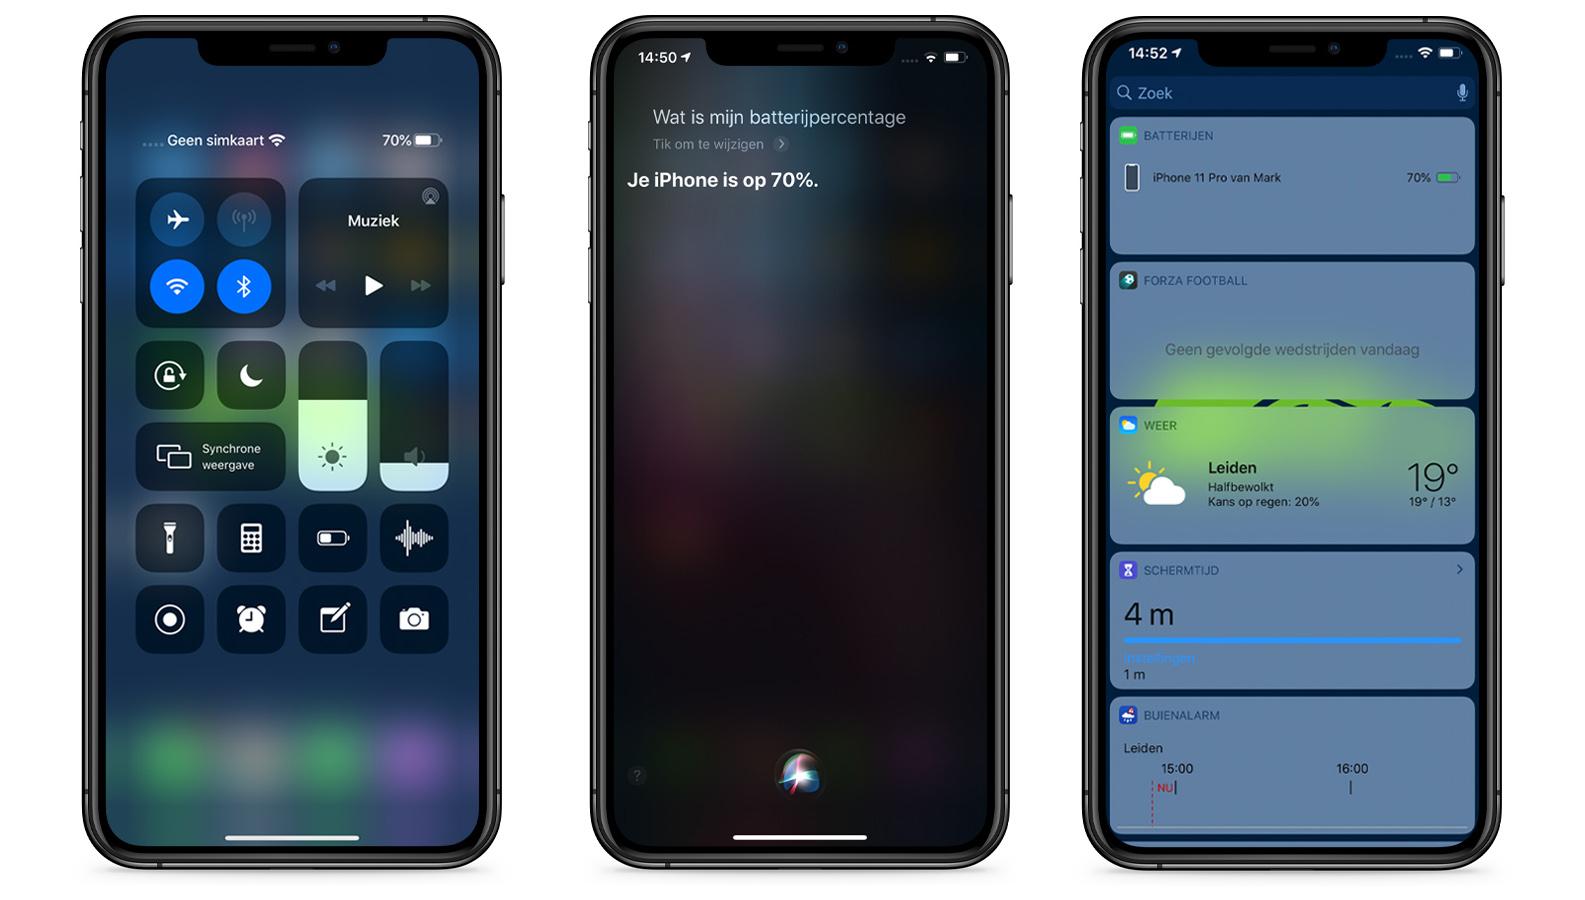 iPhone 11 batterijpercentage percentage batterij